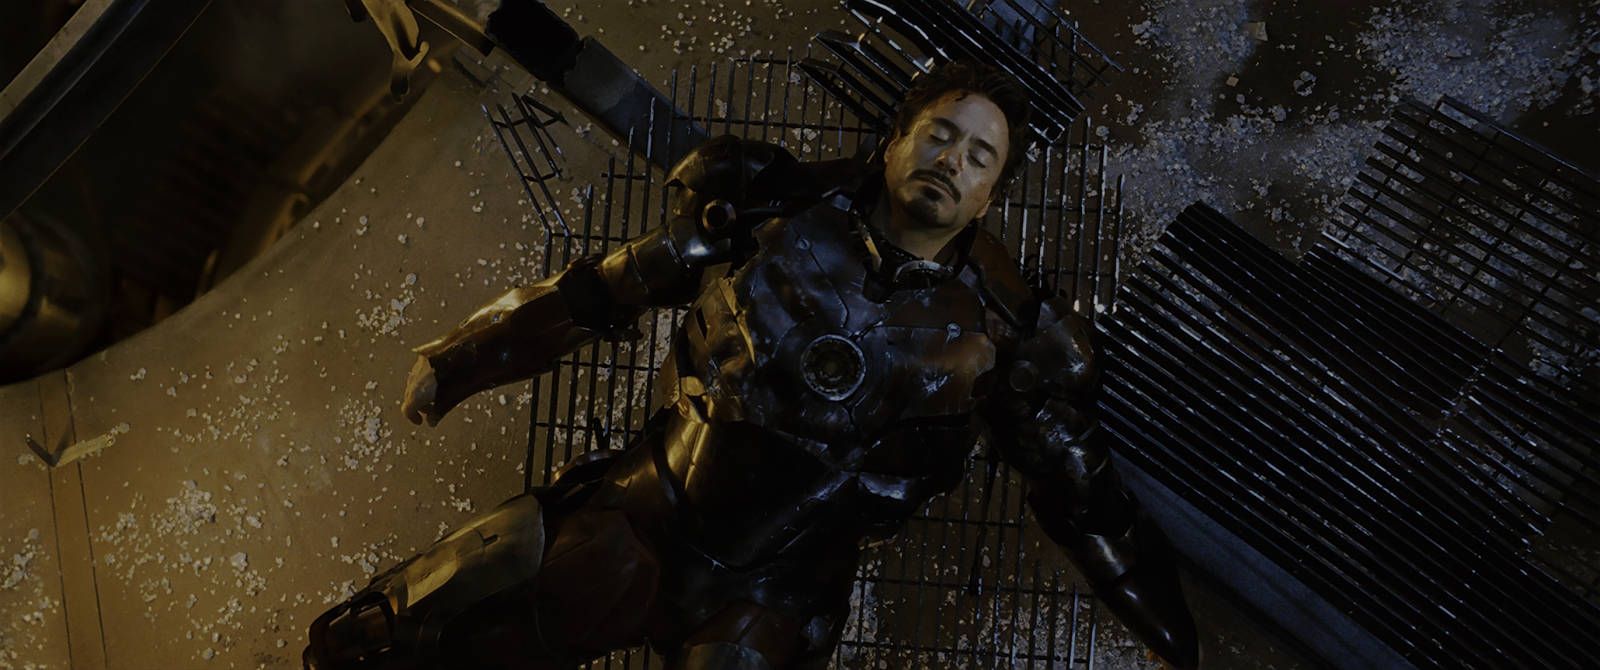 Iron Man: el Hombre de Hierro (2008) 4K UHD [HDR] Latino - Ingles captura 4